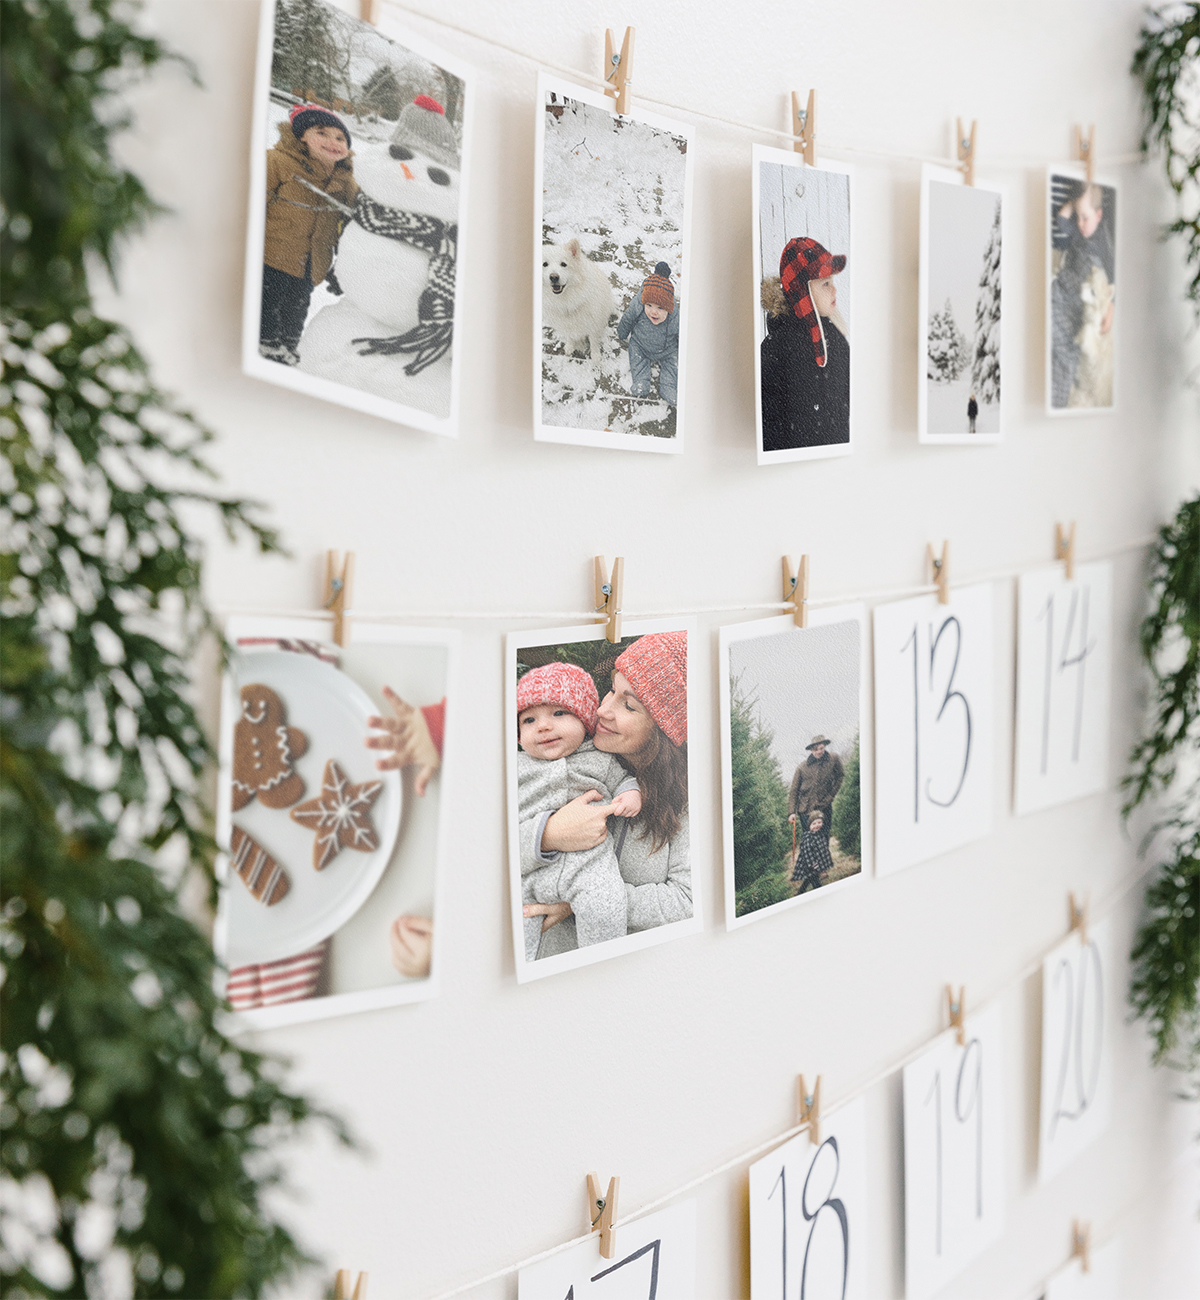 Holiday advent calendar created using Artifact Uprising photo prints